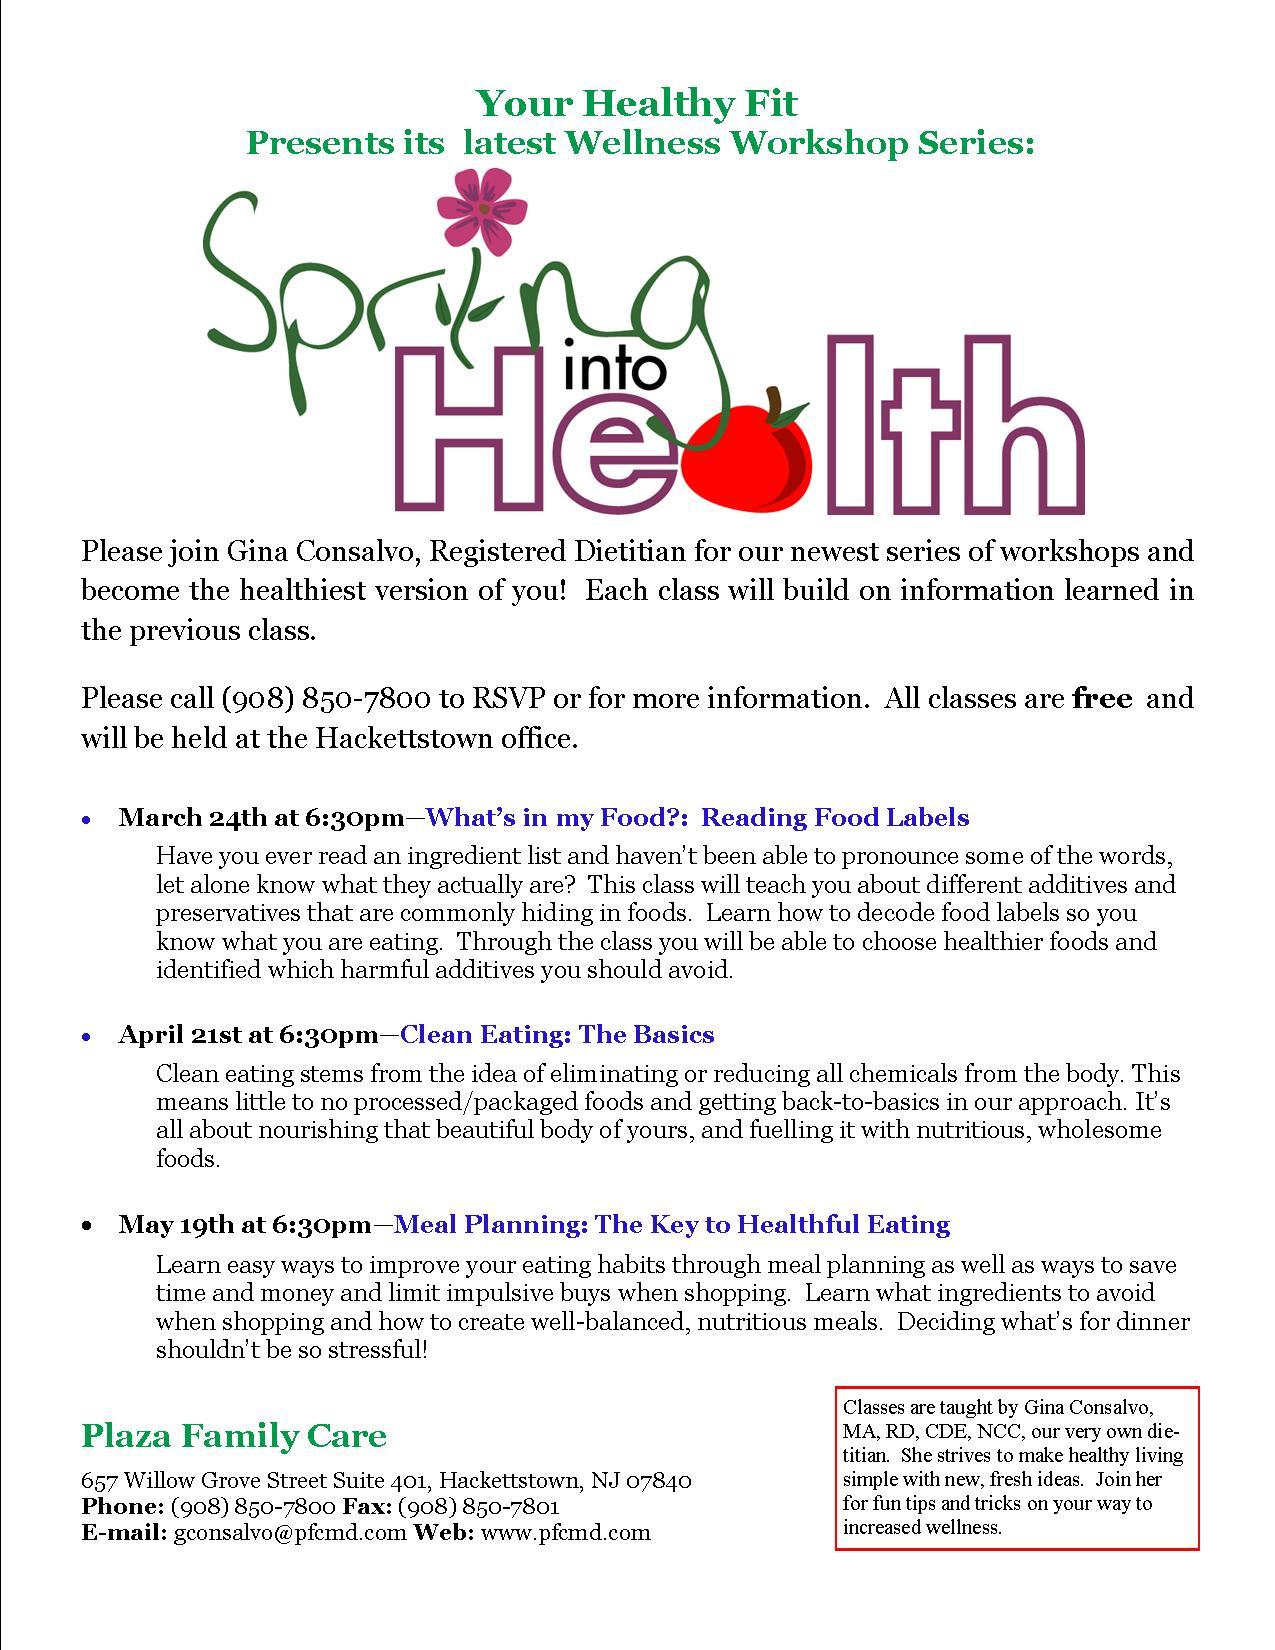 Spring Into Health 2015